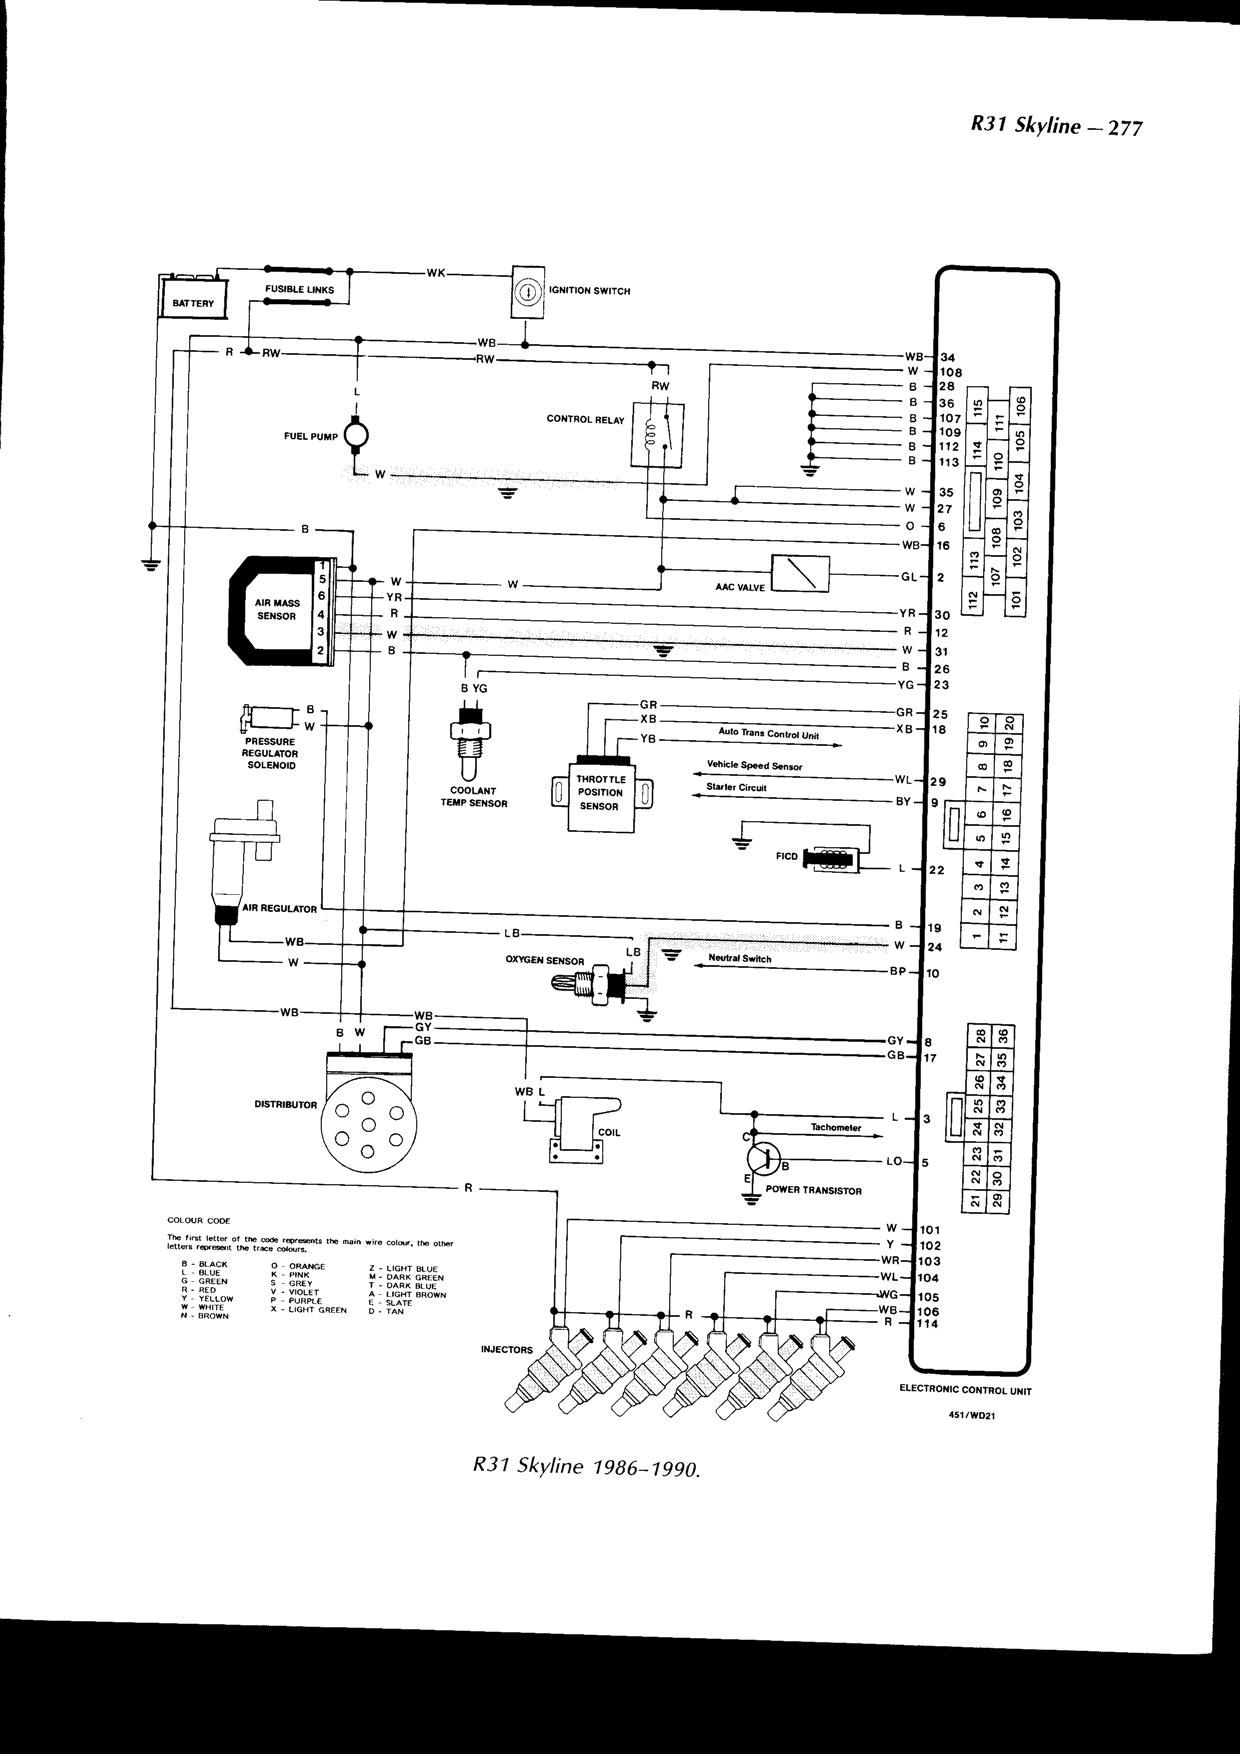 Nissan 1400 Electrical Wiring Diagram | Nissan | Pinterest - Nissan Wiring Diagram